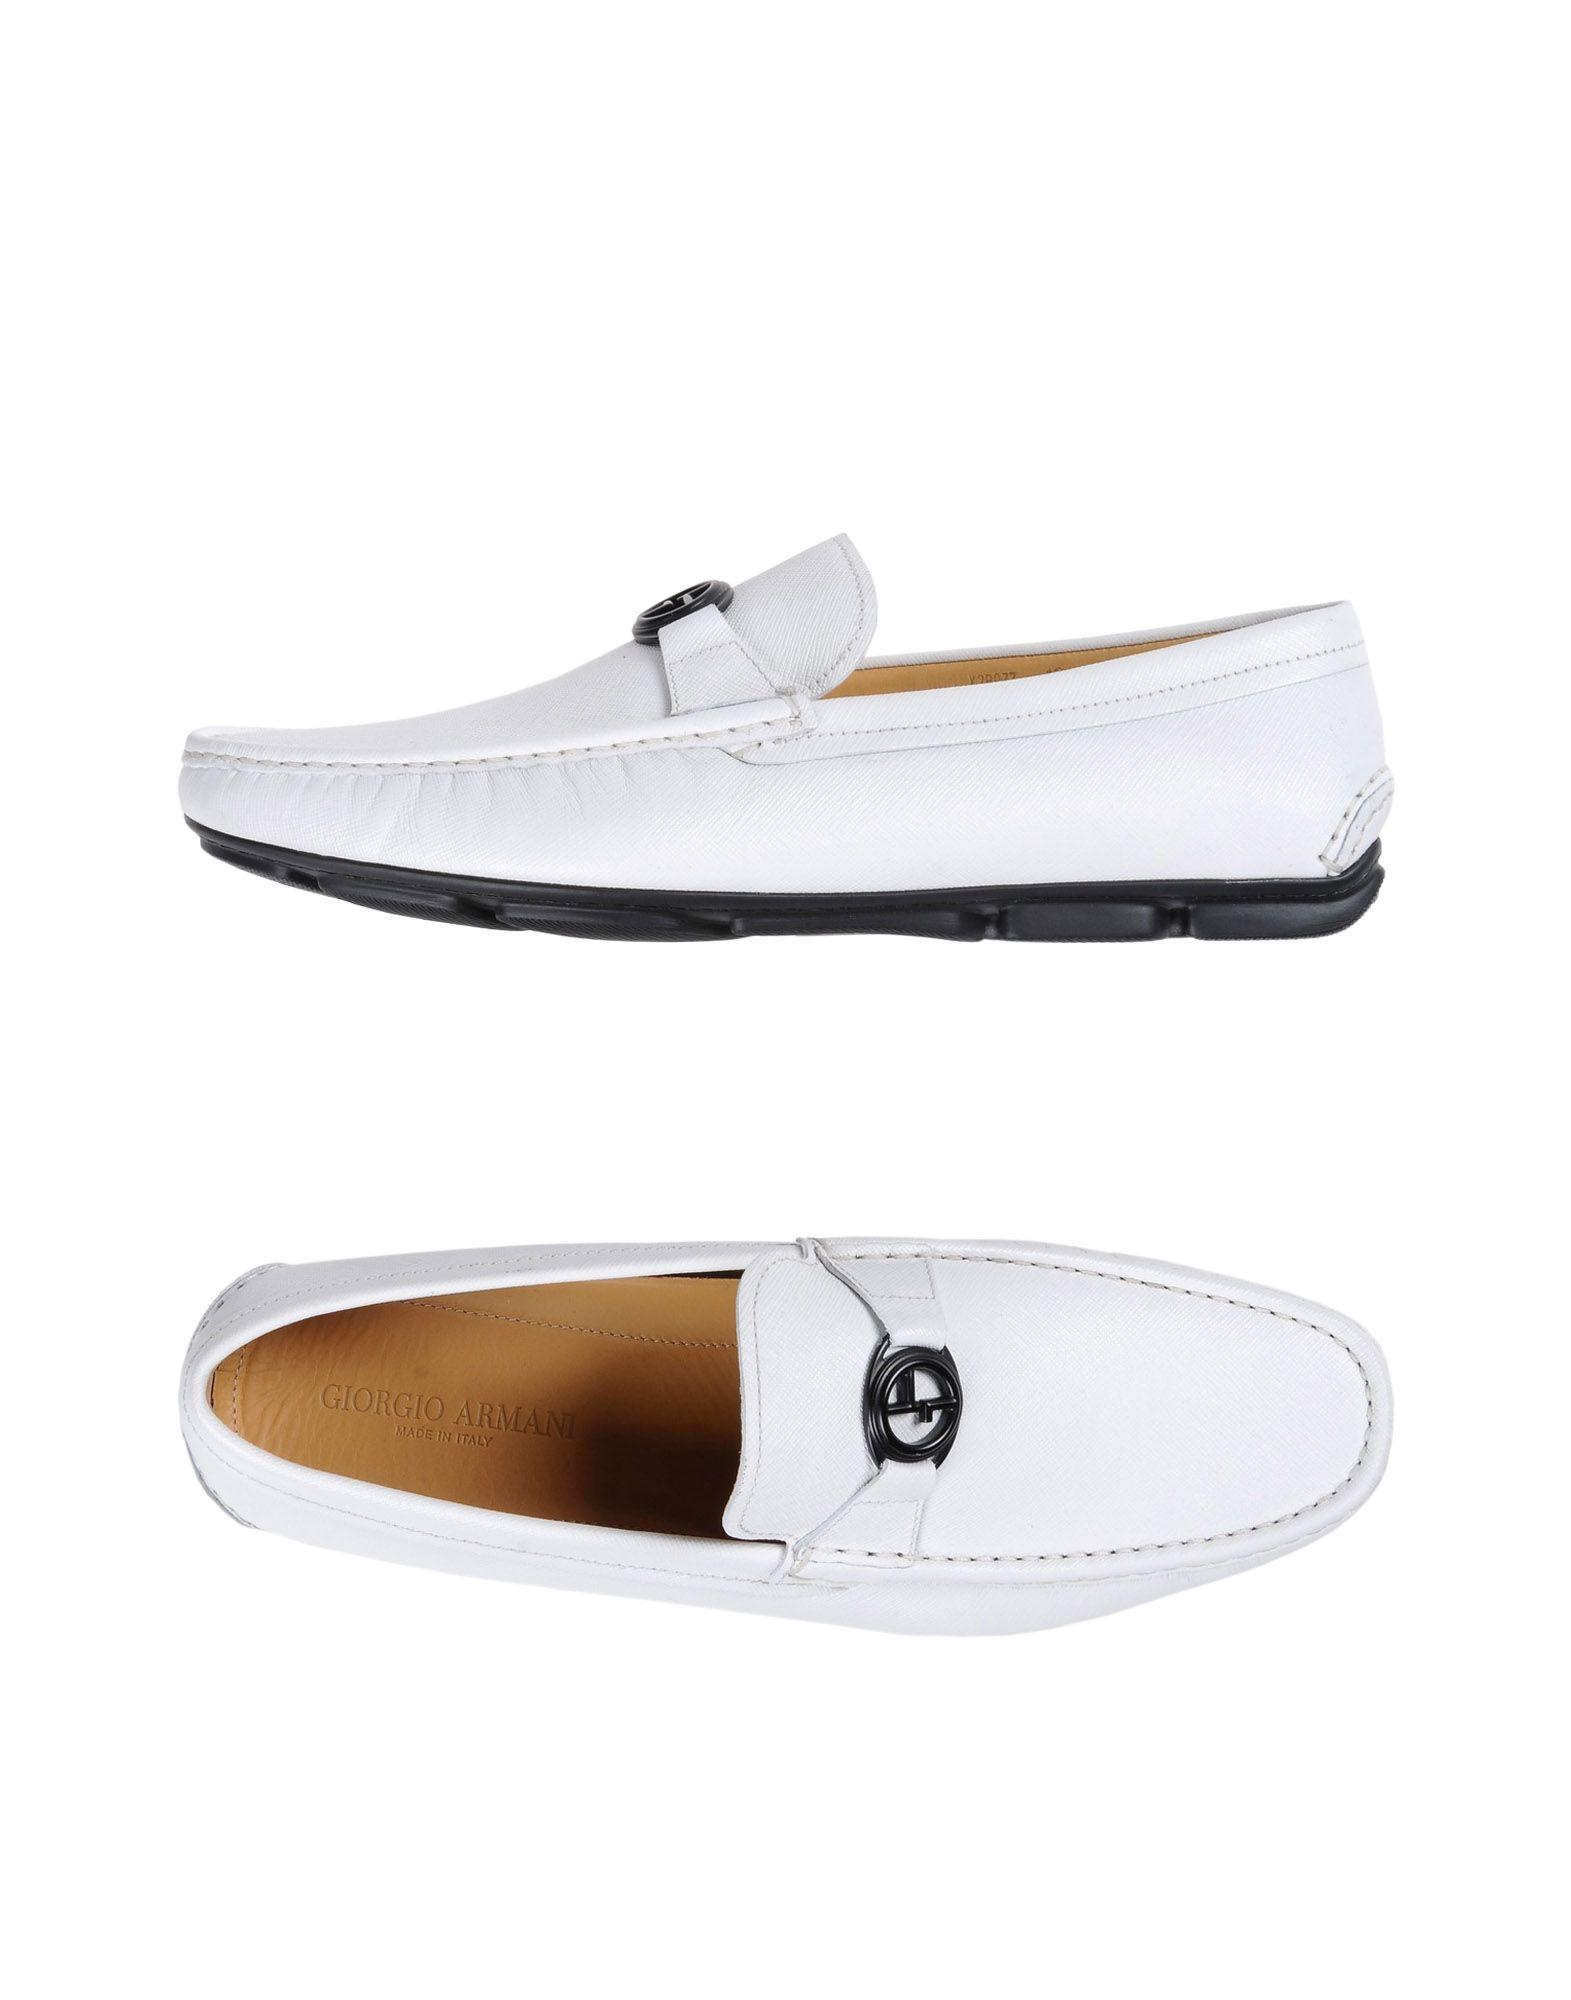 Giorgio Armani Mokassins Herren  44913008XE Gute Qualität beliebte Schuhe